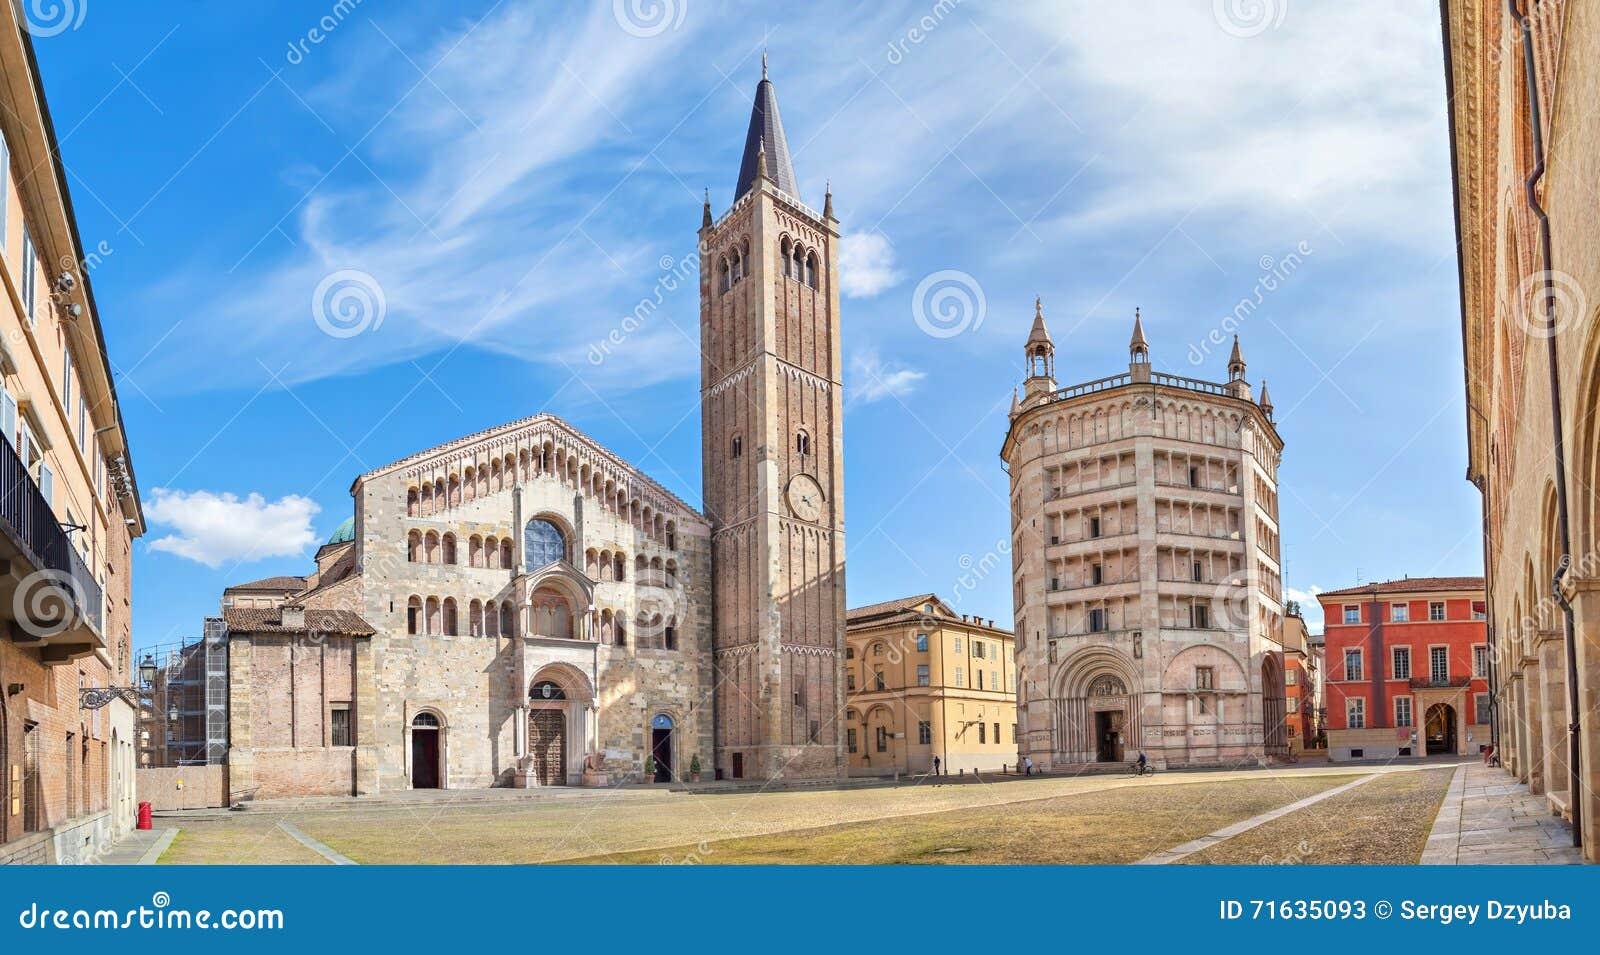 Panorama von Piazza Duomo in Parma